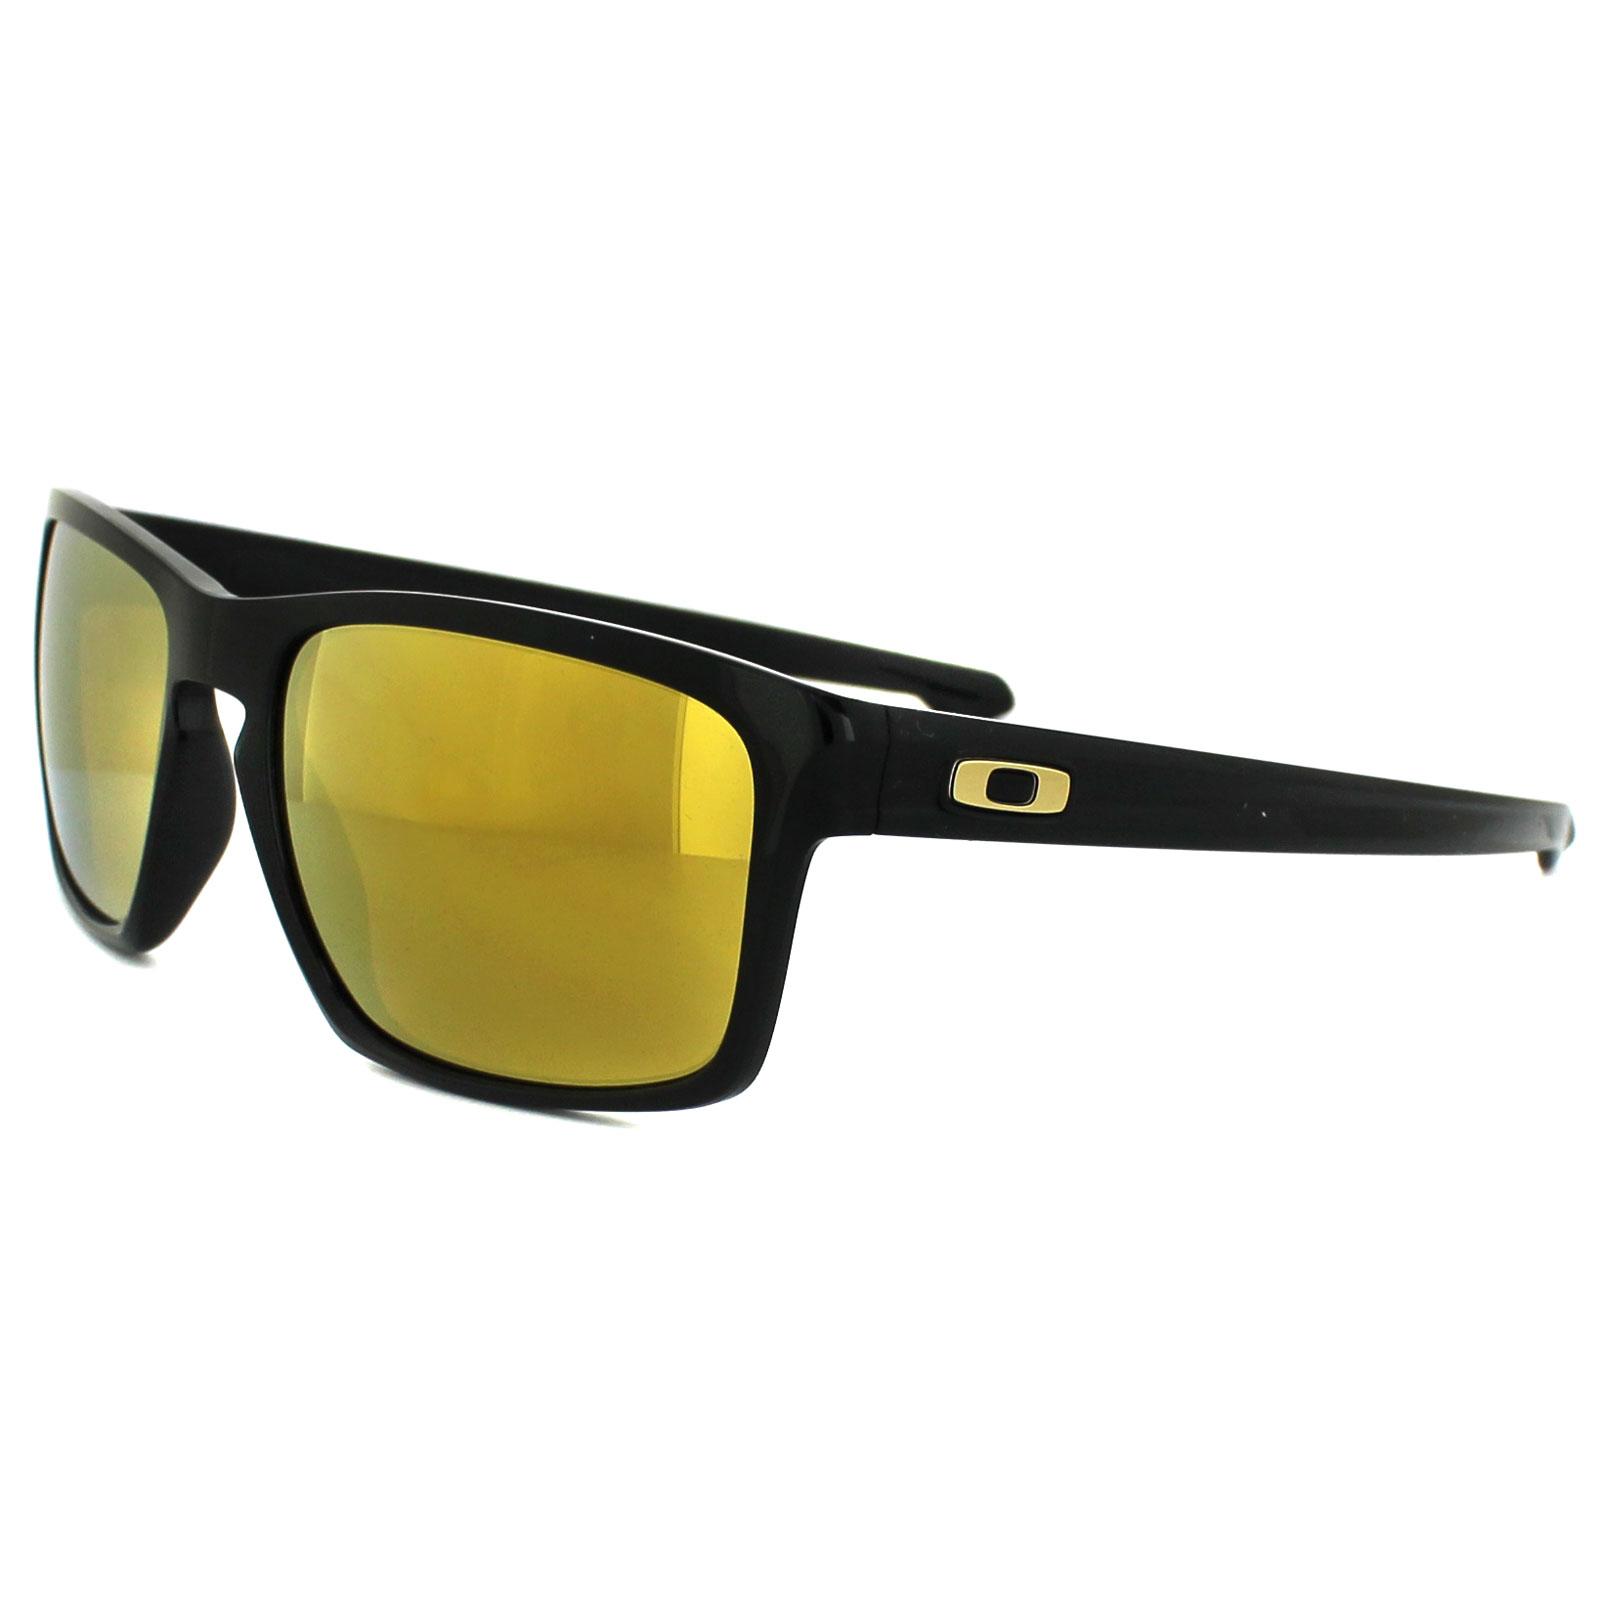 7e0a43f5a5a96 Sentinel Oakley Sunglasses Sliver OO9262-05 Polished Black 24K Iridium